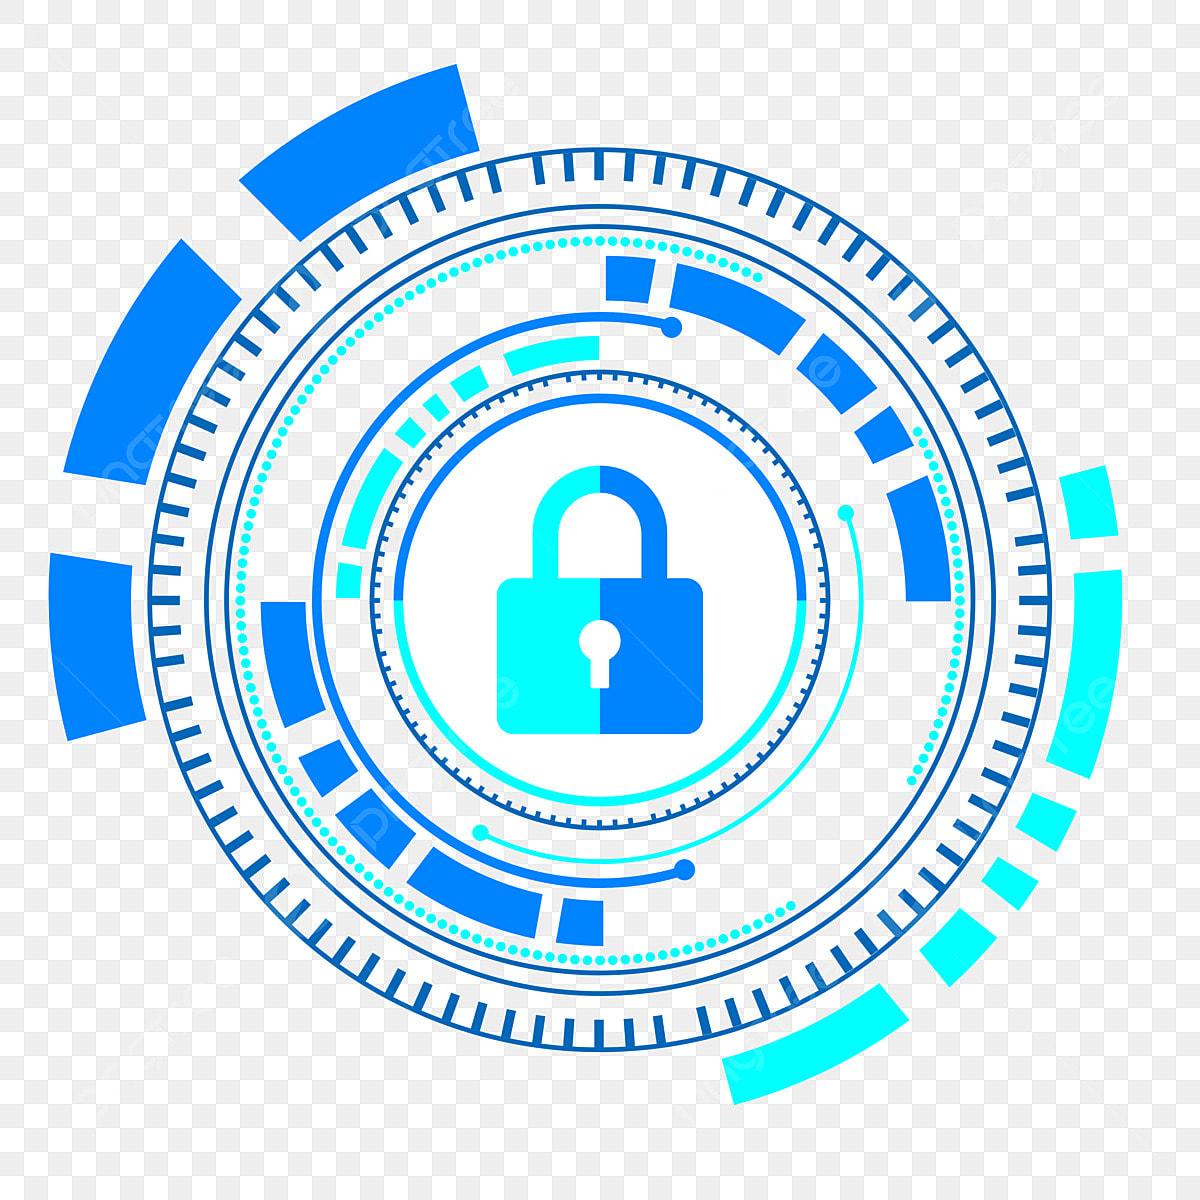 Creative Network Security Logo Free Logo Design Template ...